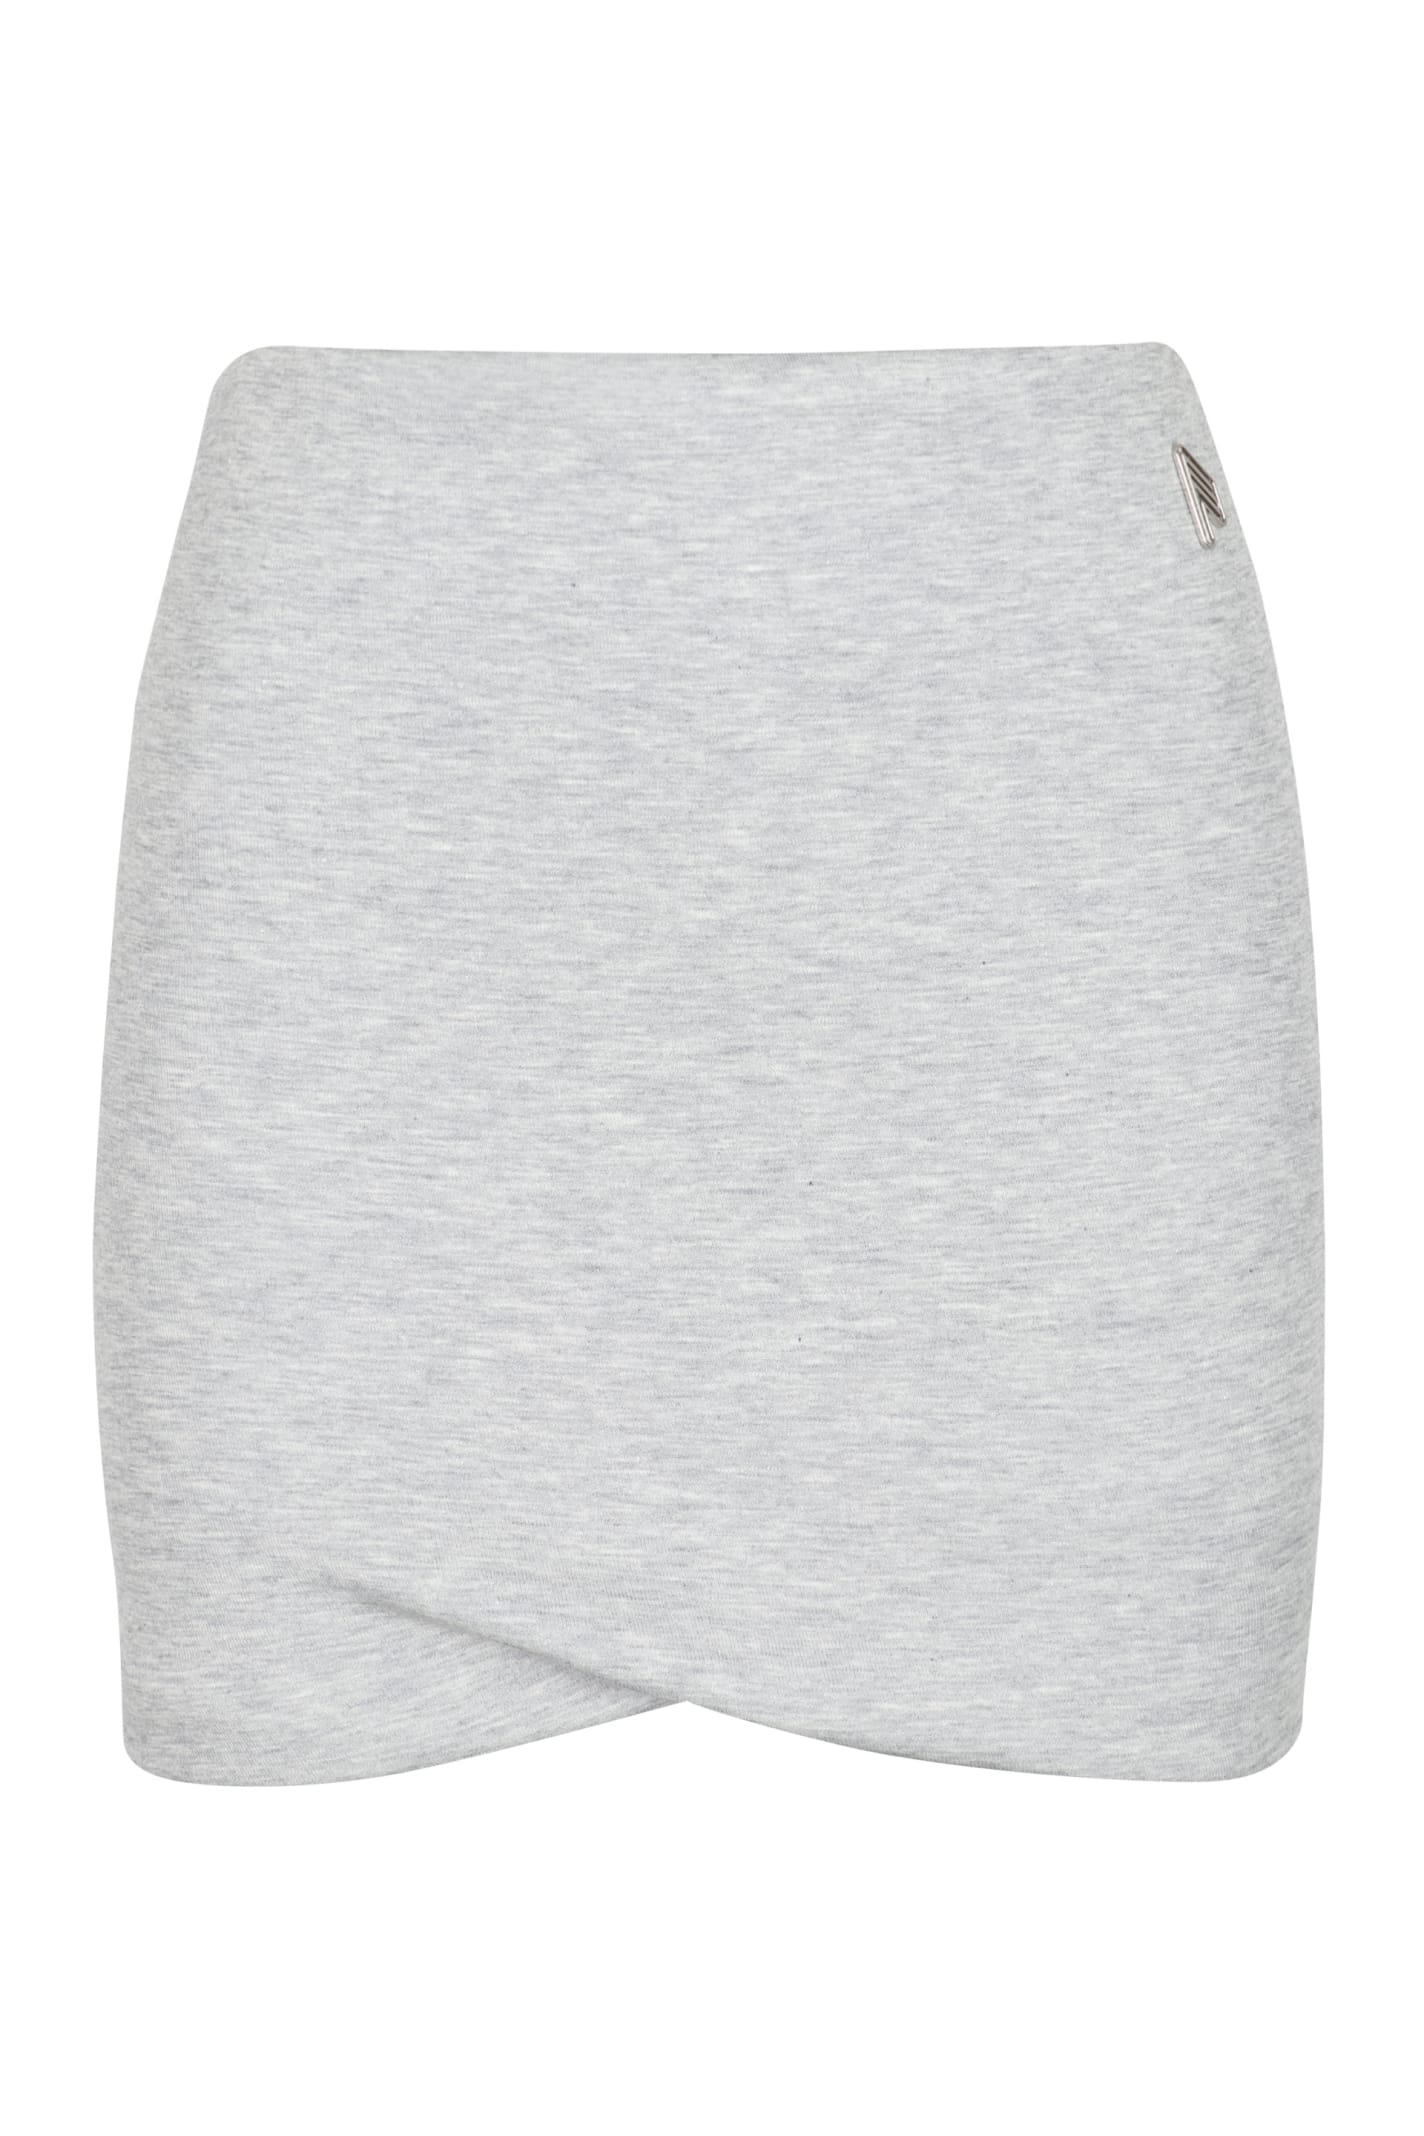 Attico Mini skirts EZRA DRAPED SKIRT